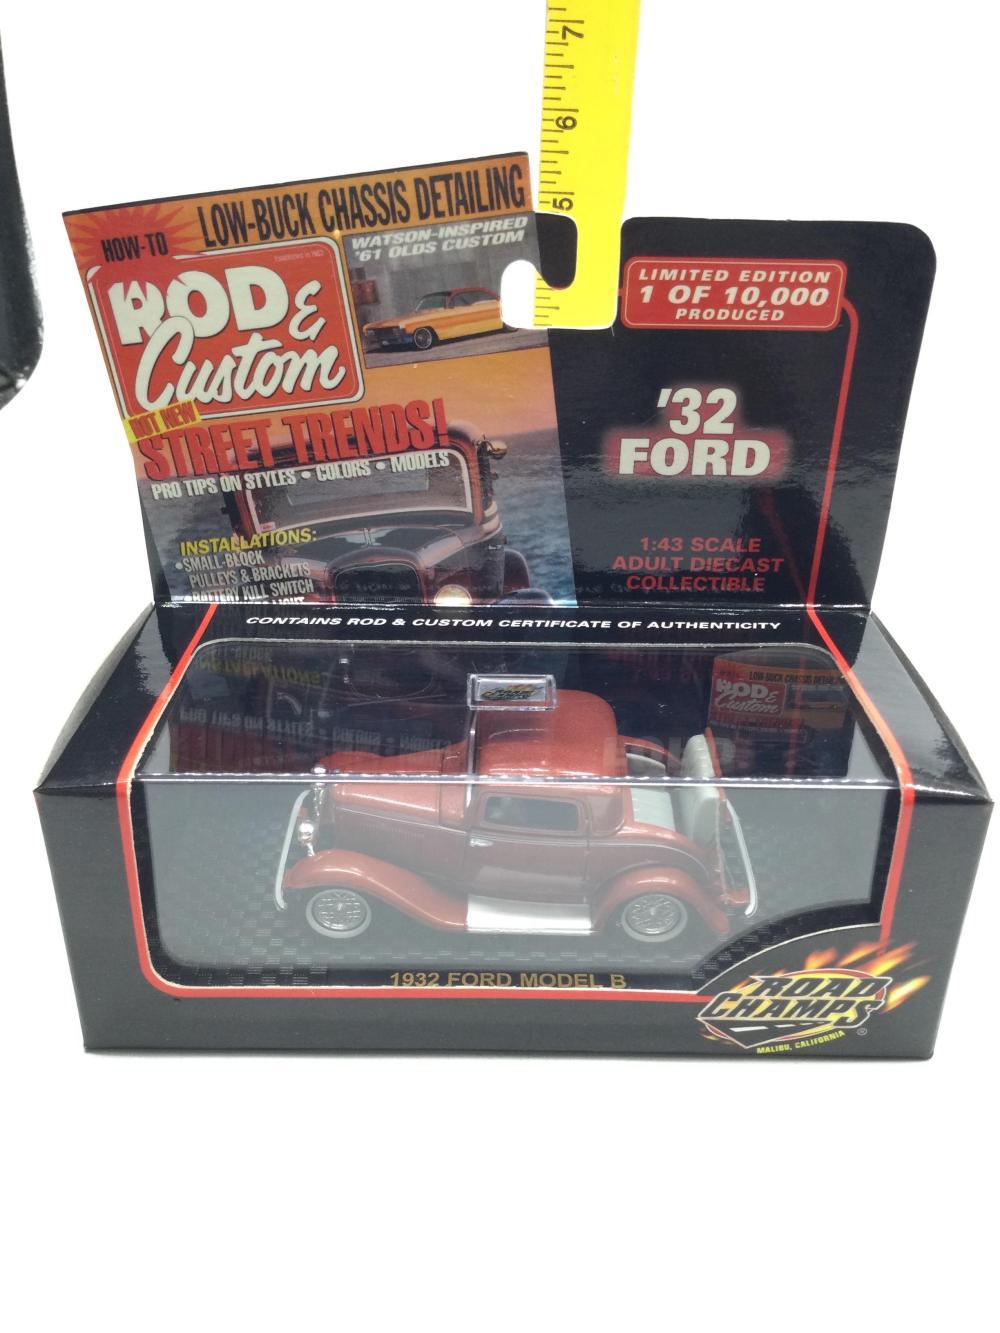 Rod & Custom 1:43 Scale